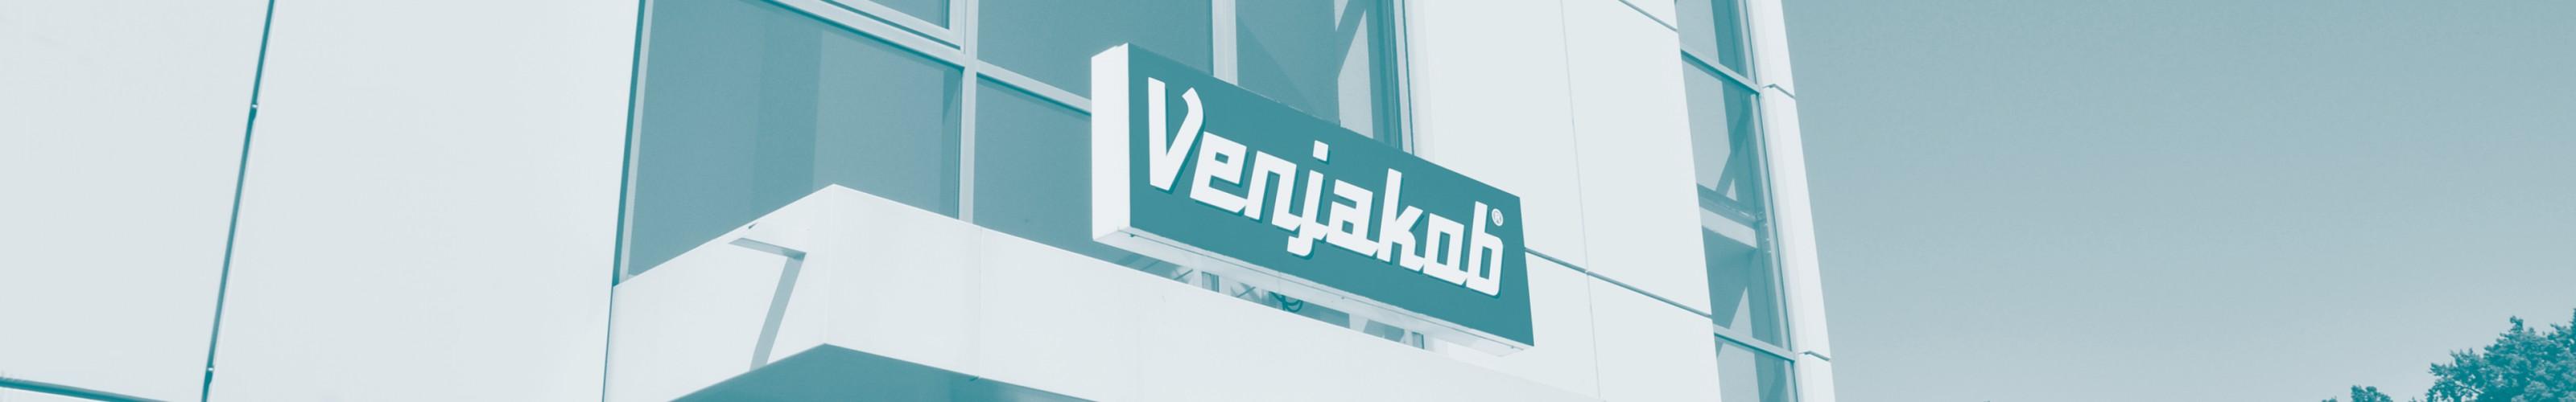 Venjakob Maschinenbau Hauptsitz Rheda-Wiedenbrück